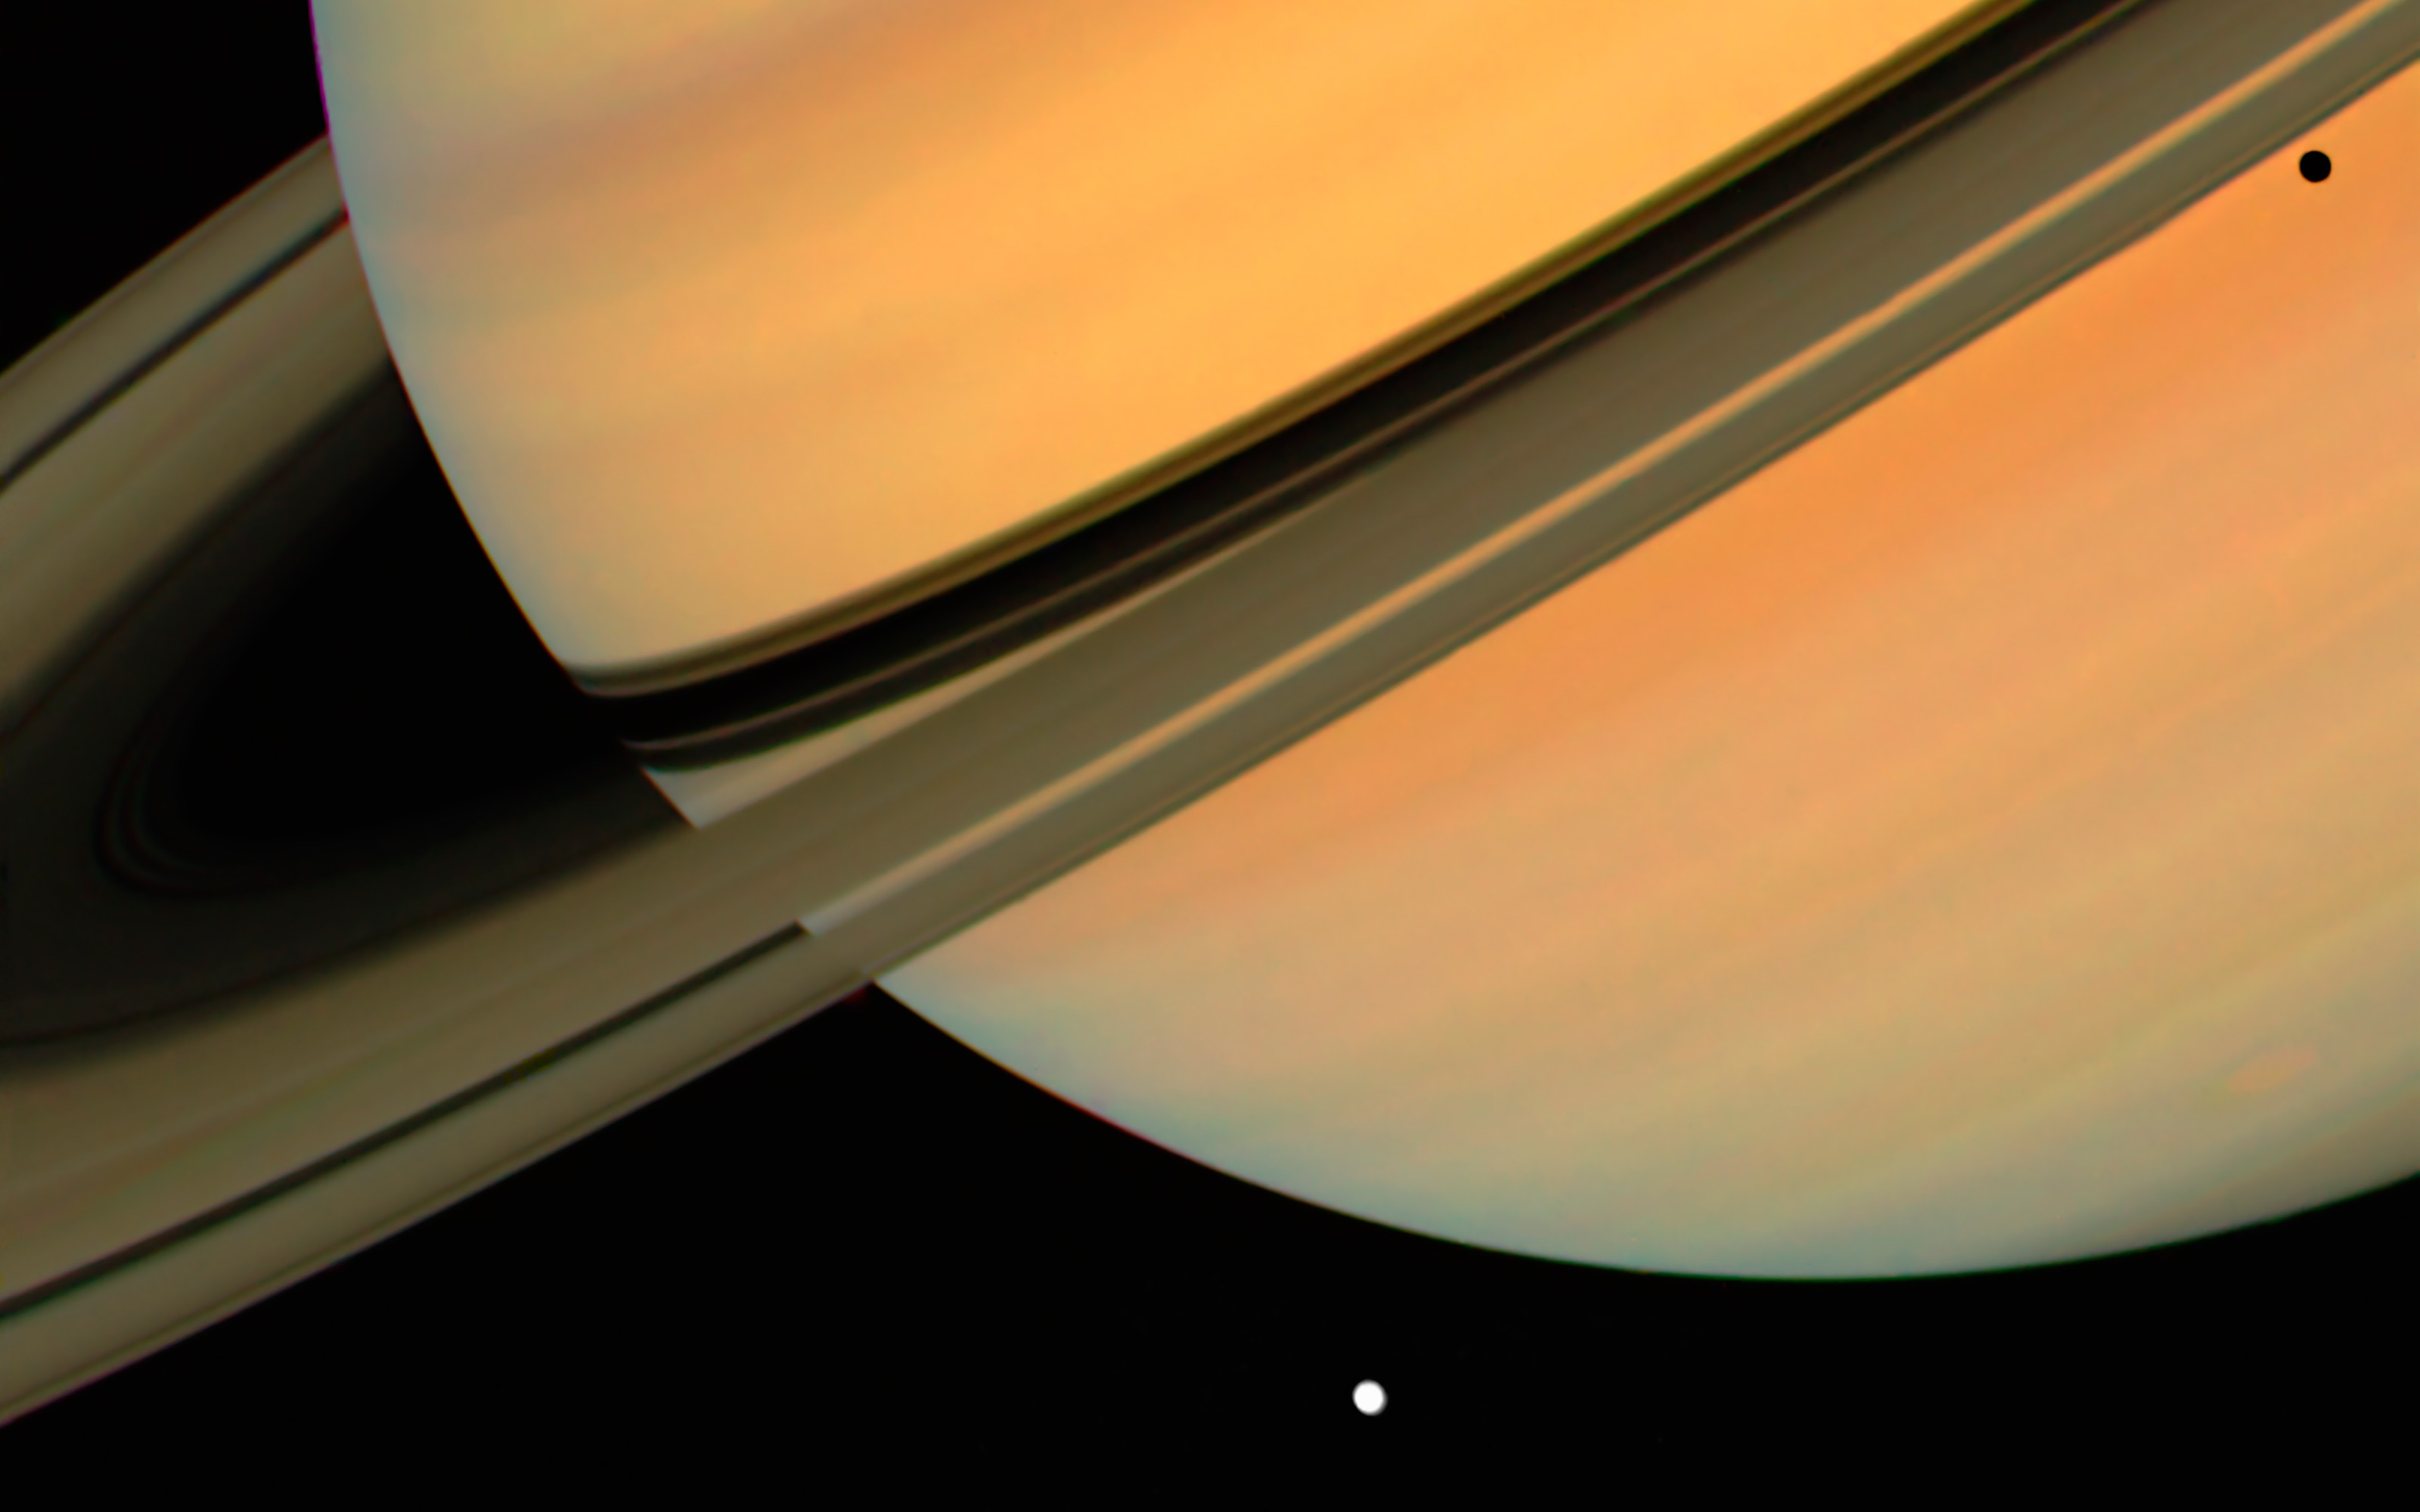 El planeta jupiter - 3200x2000